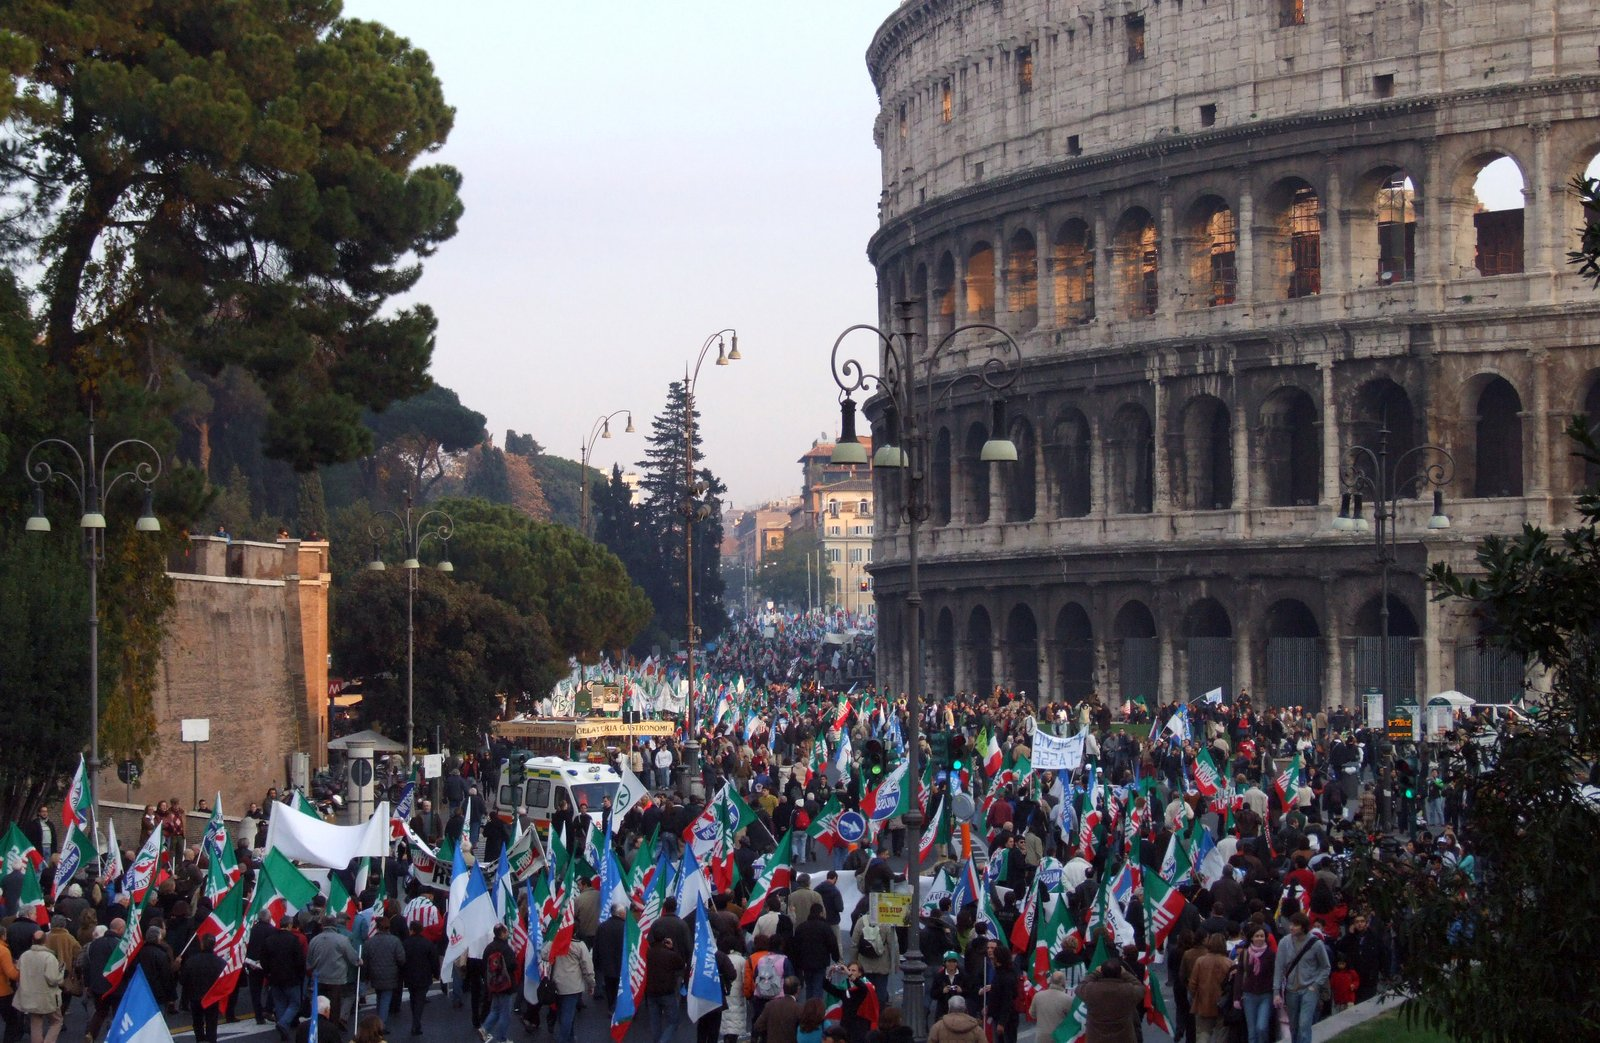 Near Colosseum Stock Photo